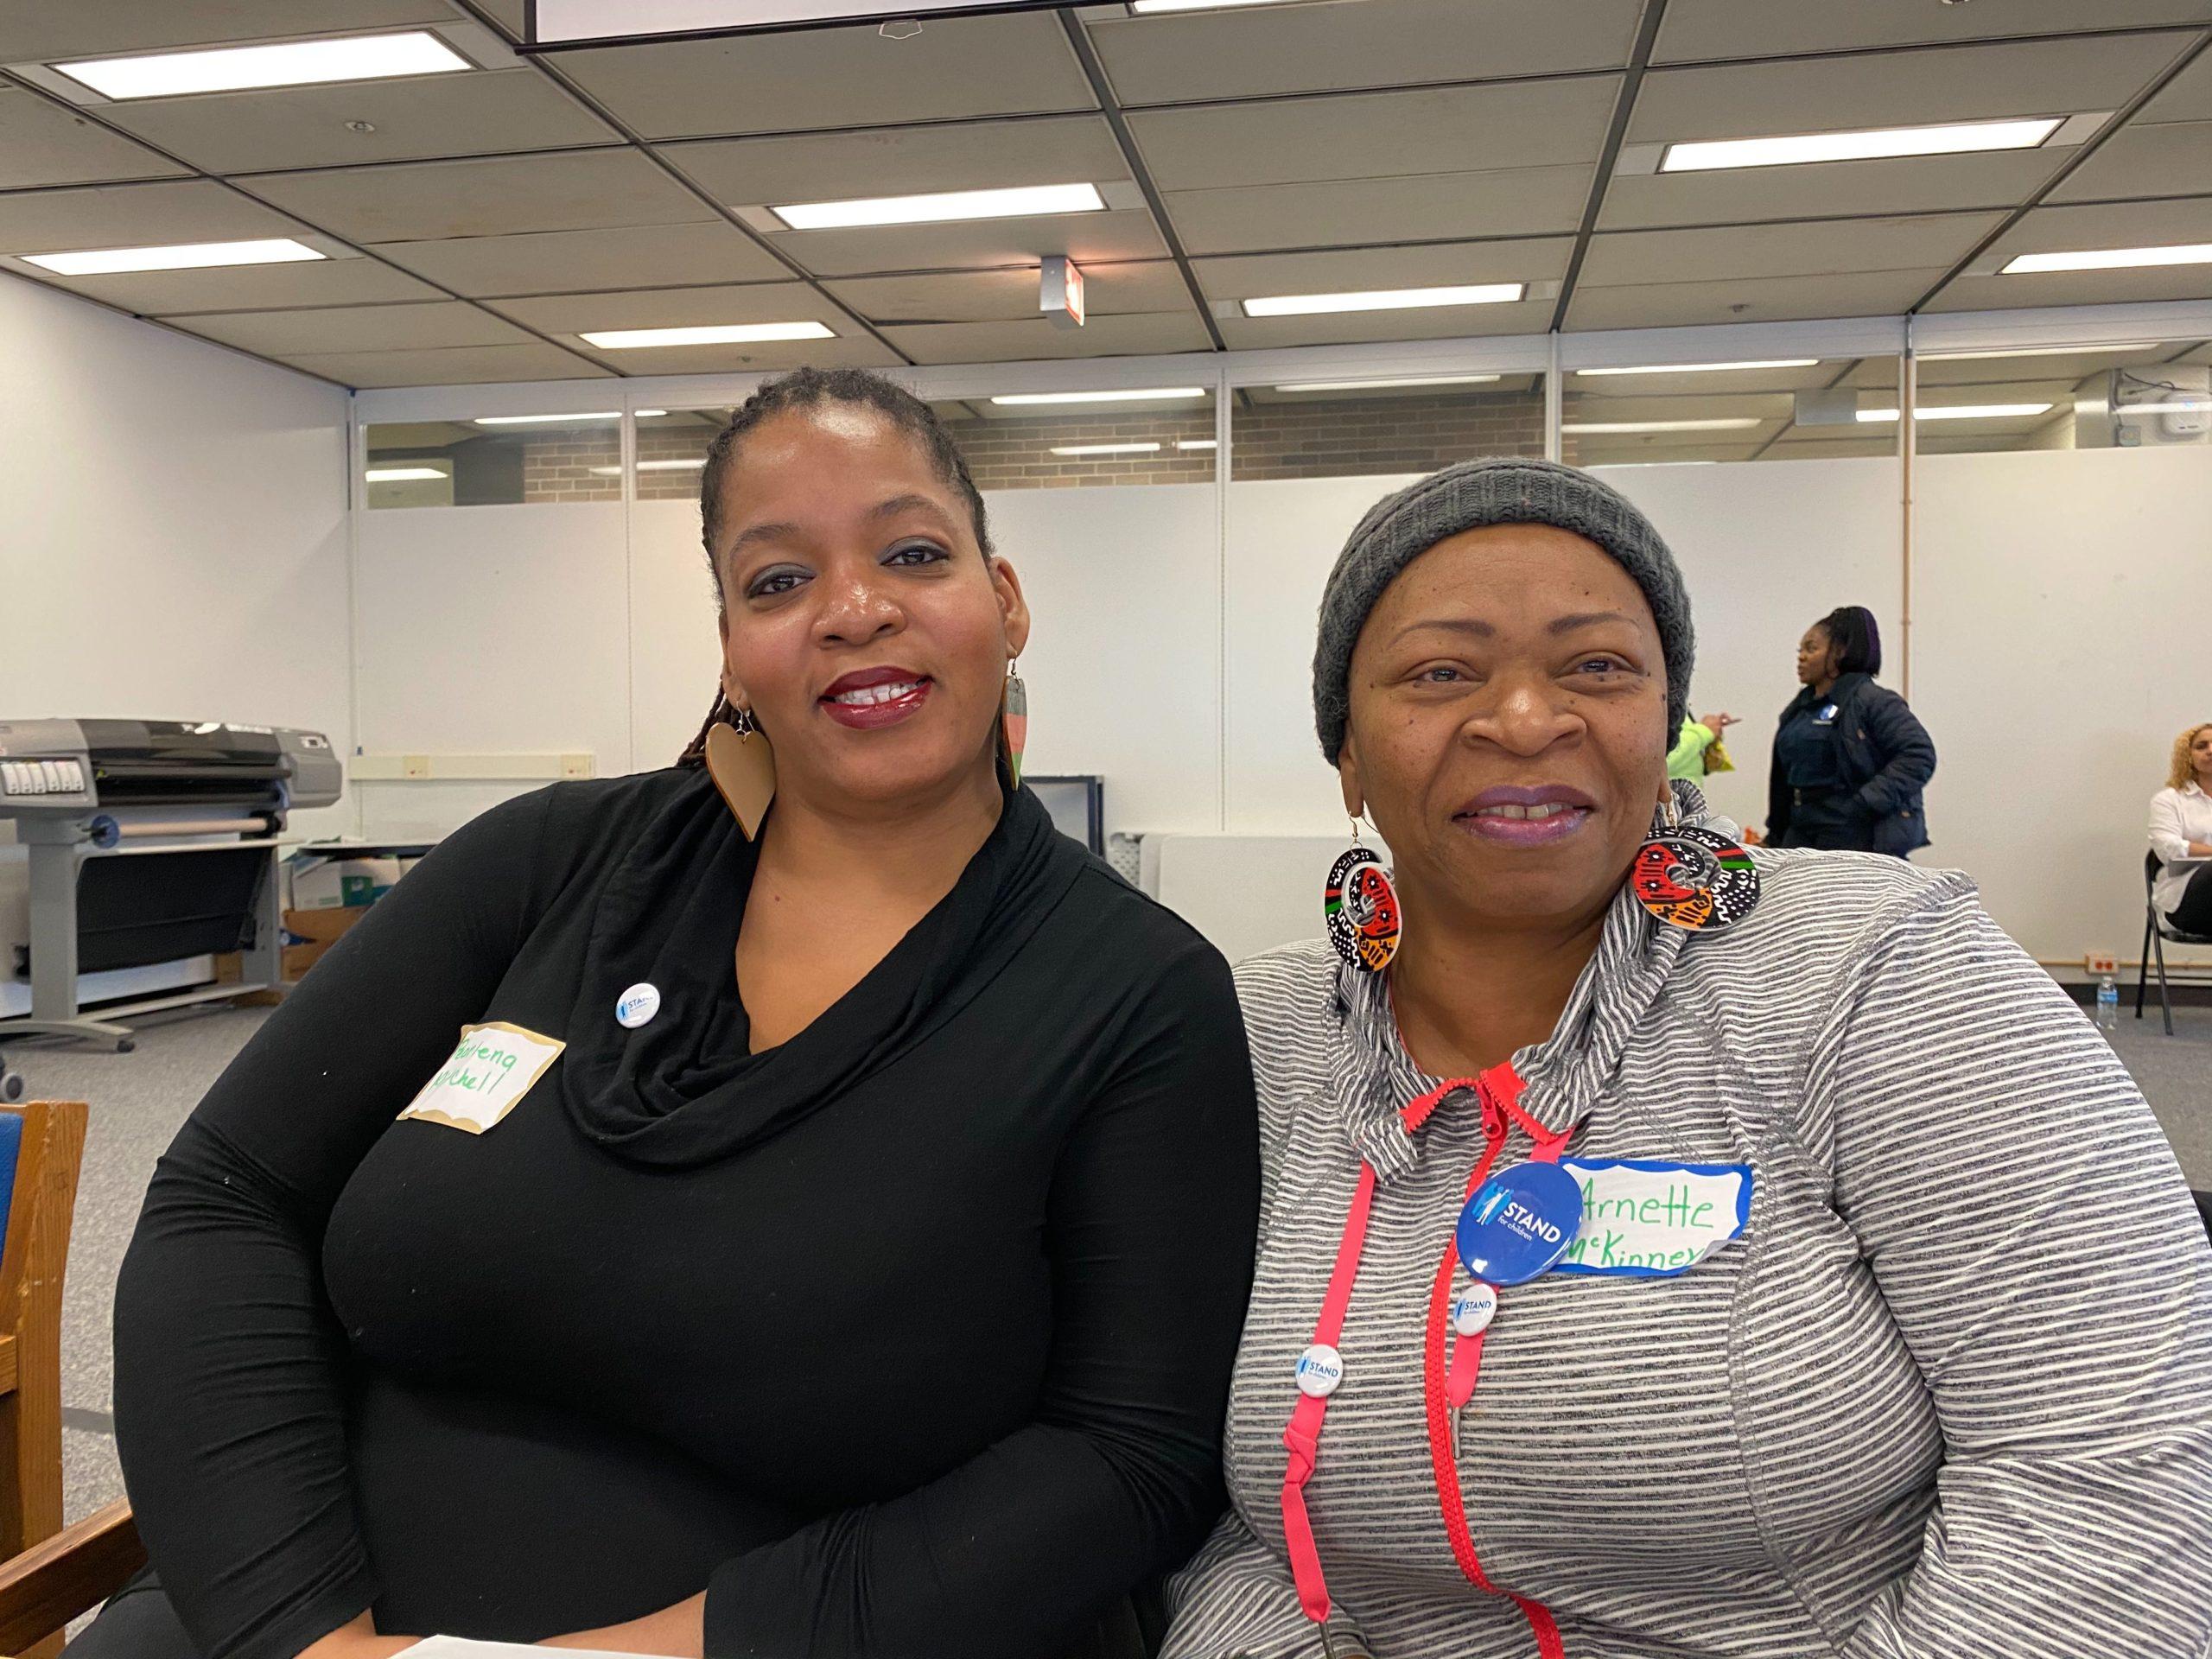 Pearlena Mitchell, left, and Arnette McKinney teach at Chicago's John Fiske Elementary School.